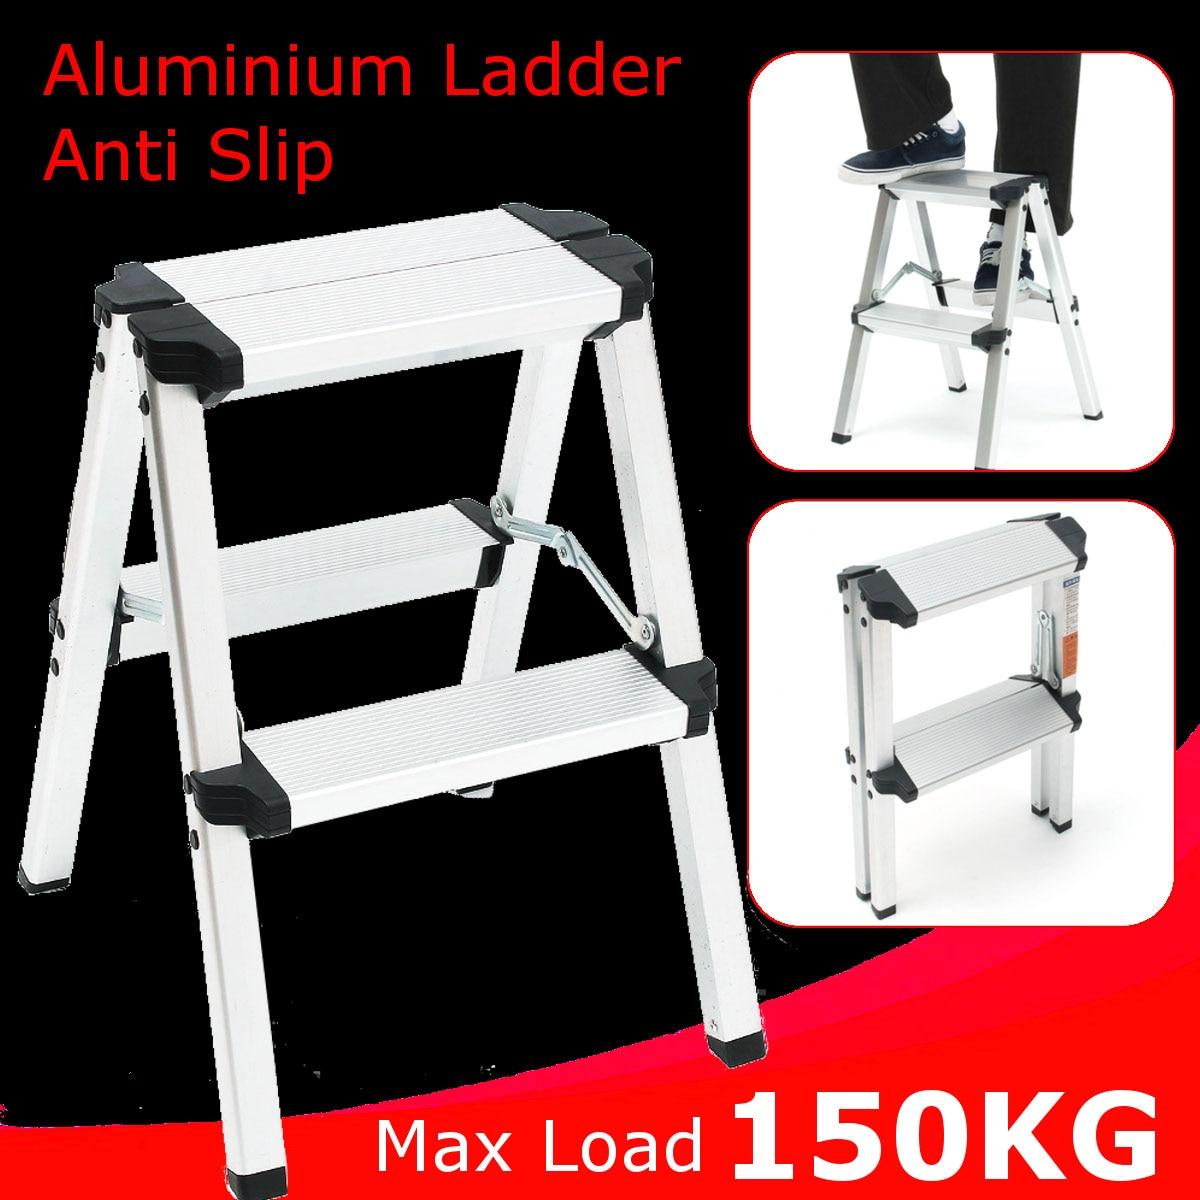 50cm Anti Slip Ladder Safety Step Folding Ladder 2 Step Stools Aluminium Multifunctional Ladder Thick Pedal Construction Tool